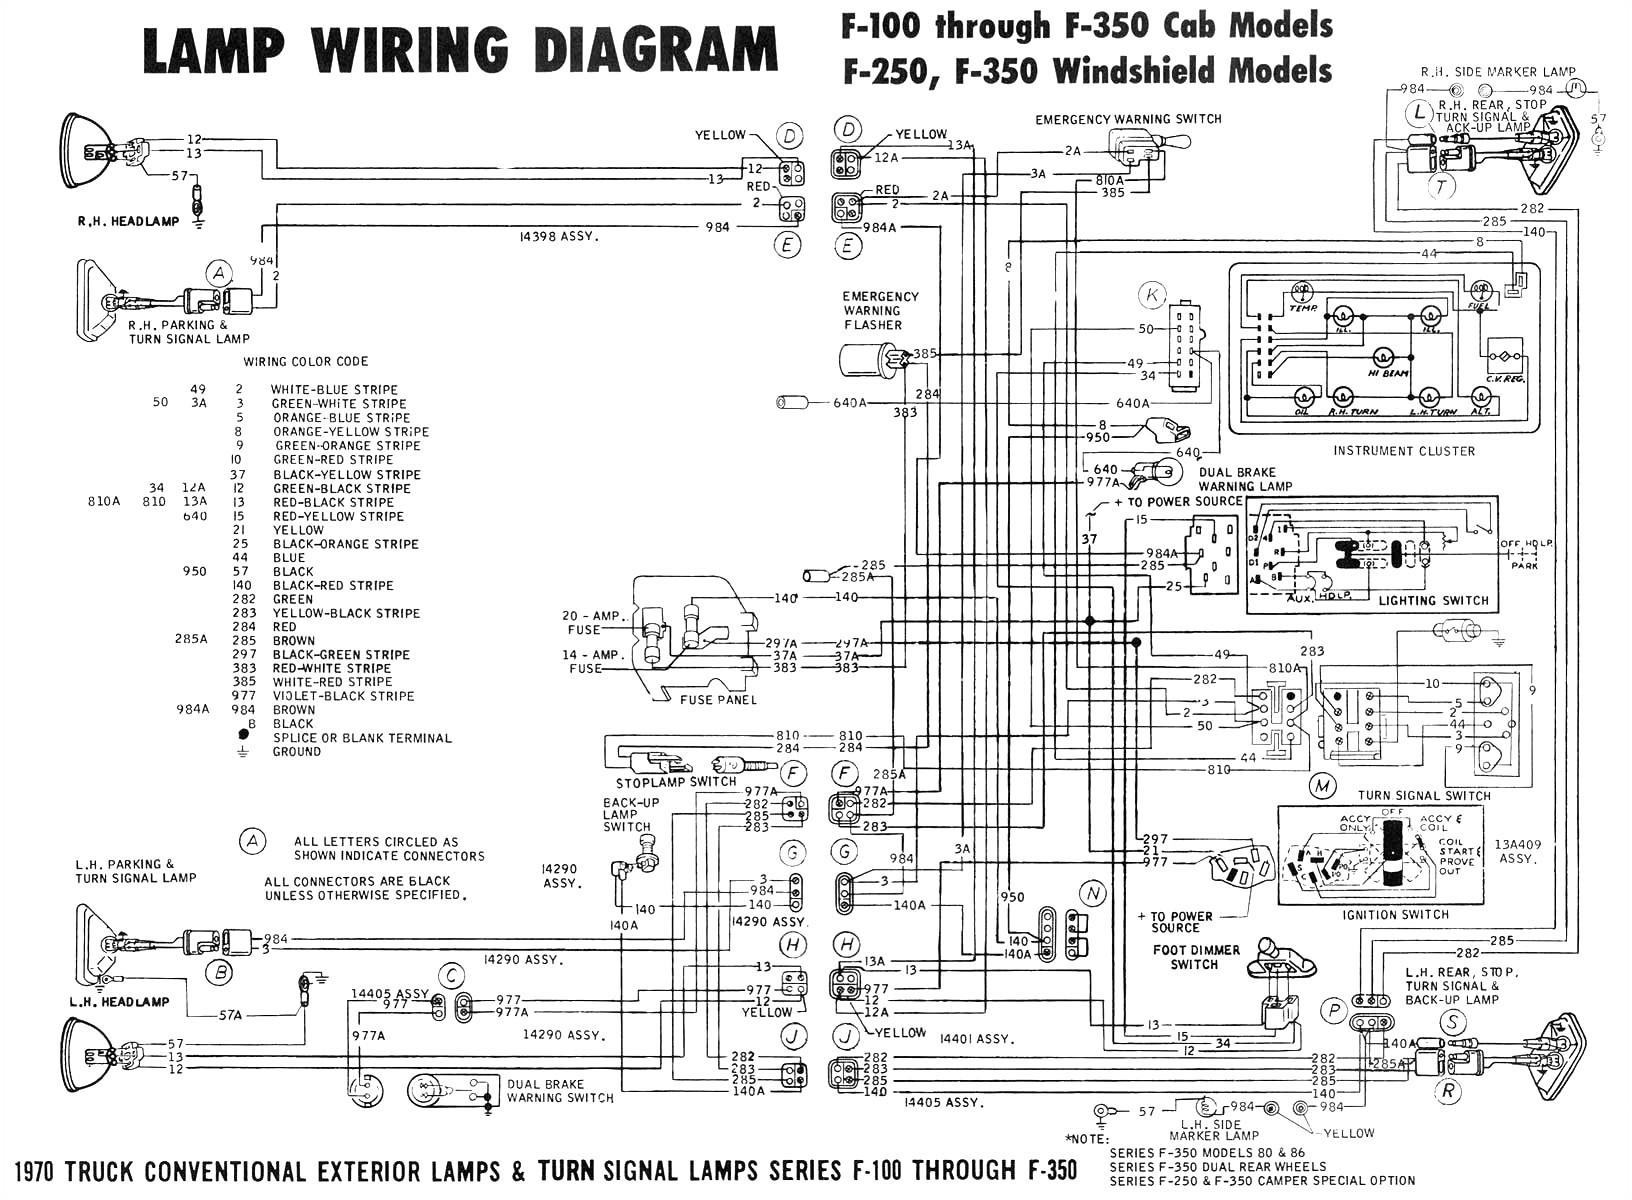 914 tach wiring wiring library suntune tach wiring diagram http wwwpic2flycom sunprotachwiring